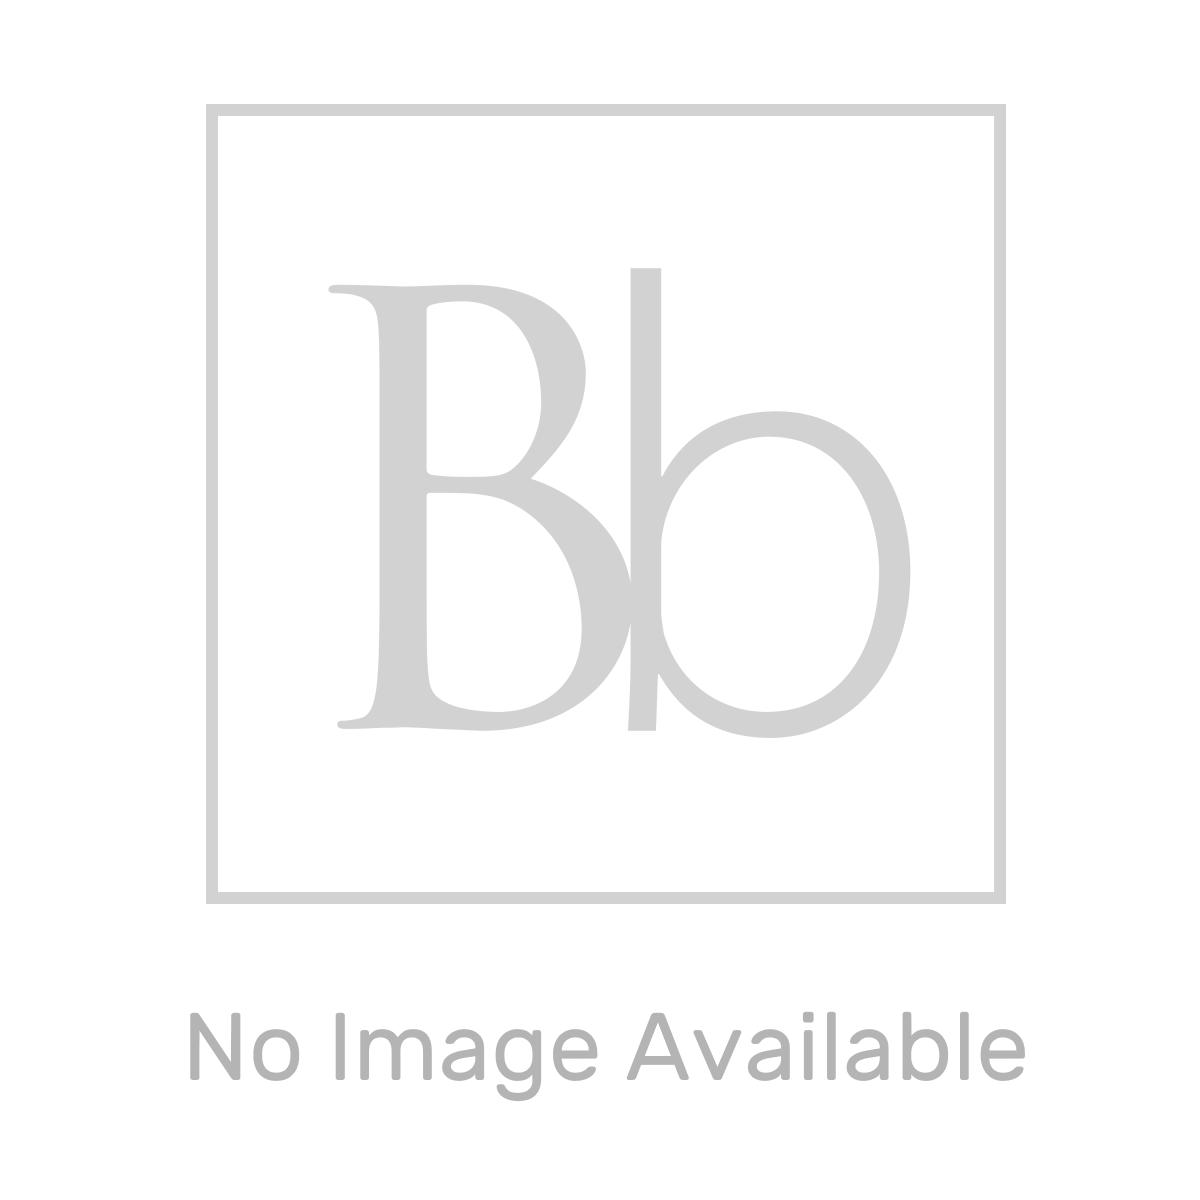 Aquadart Black Slate Shower Tray 1100 x 800 Overhead